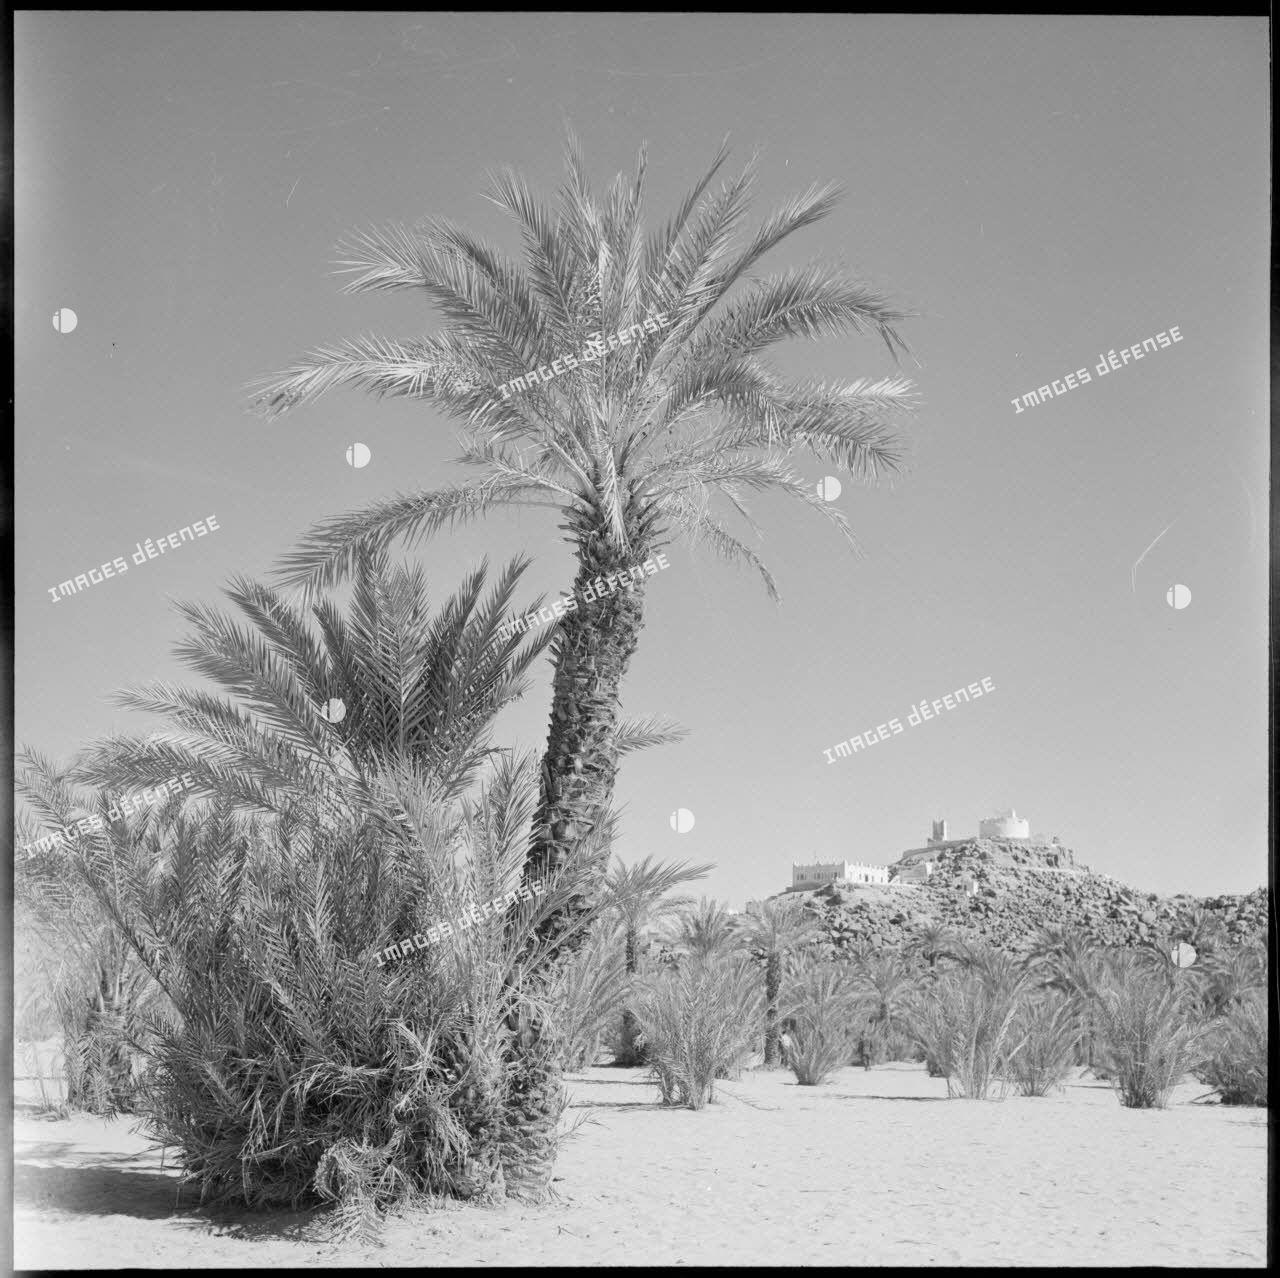 Une palmeraie à Djanet (Fort Charlet).